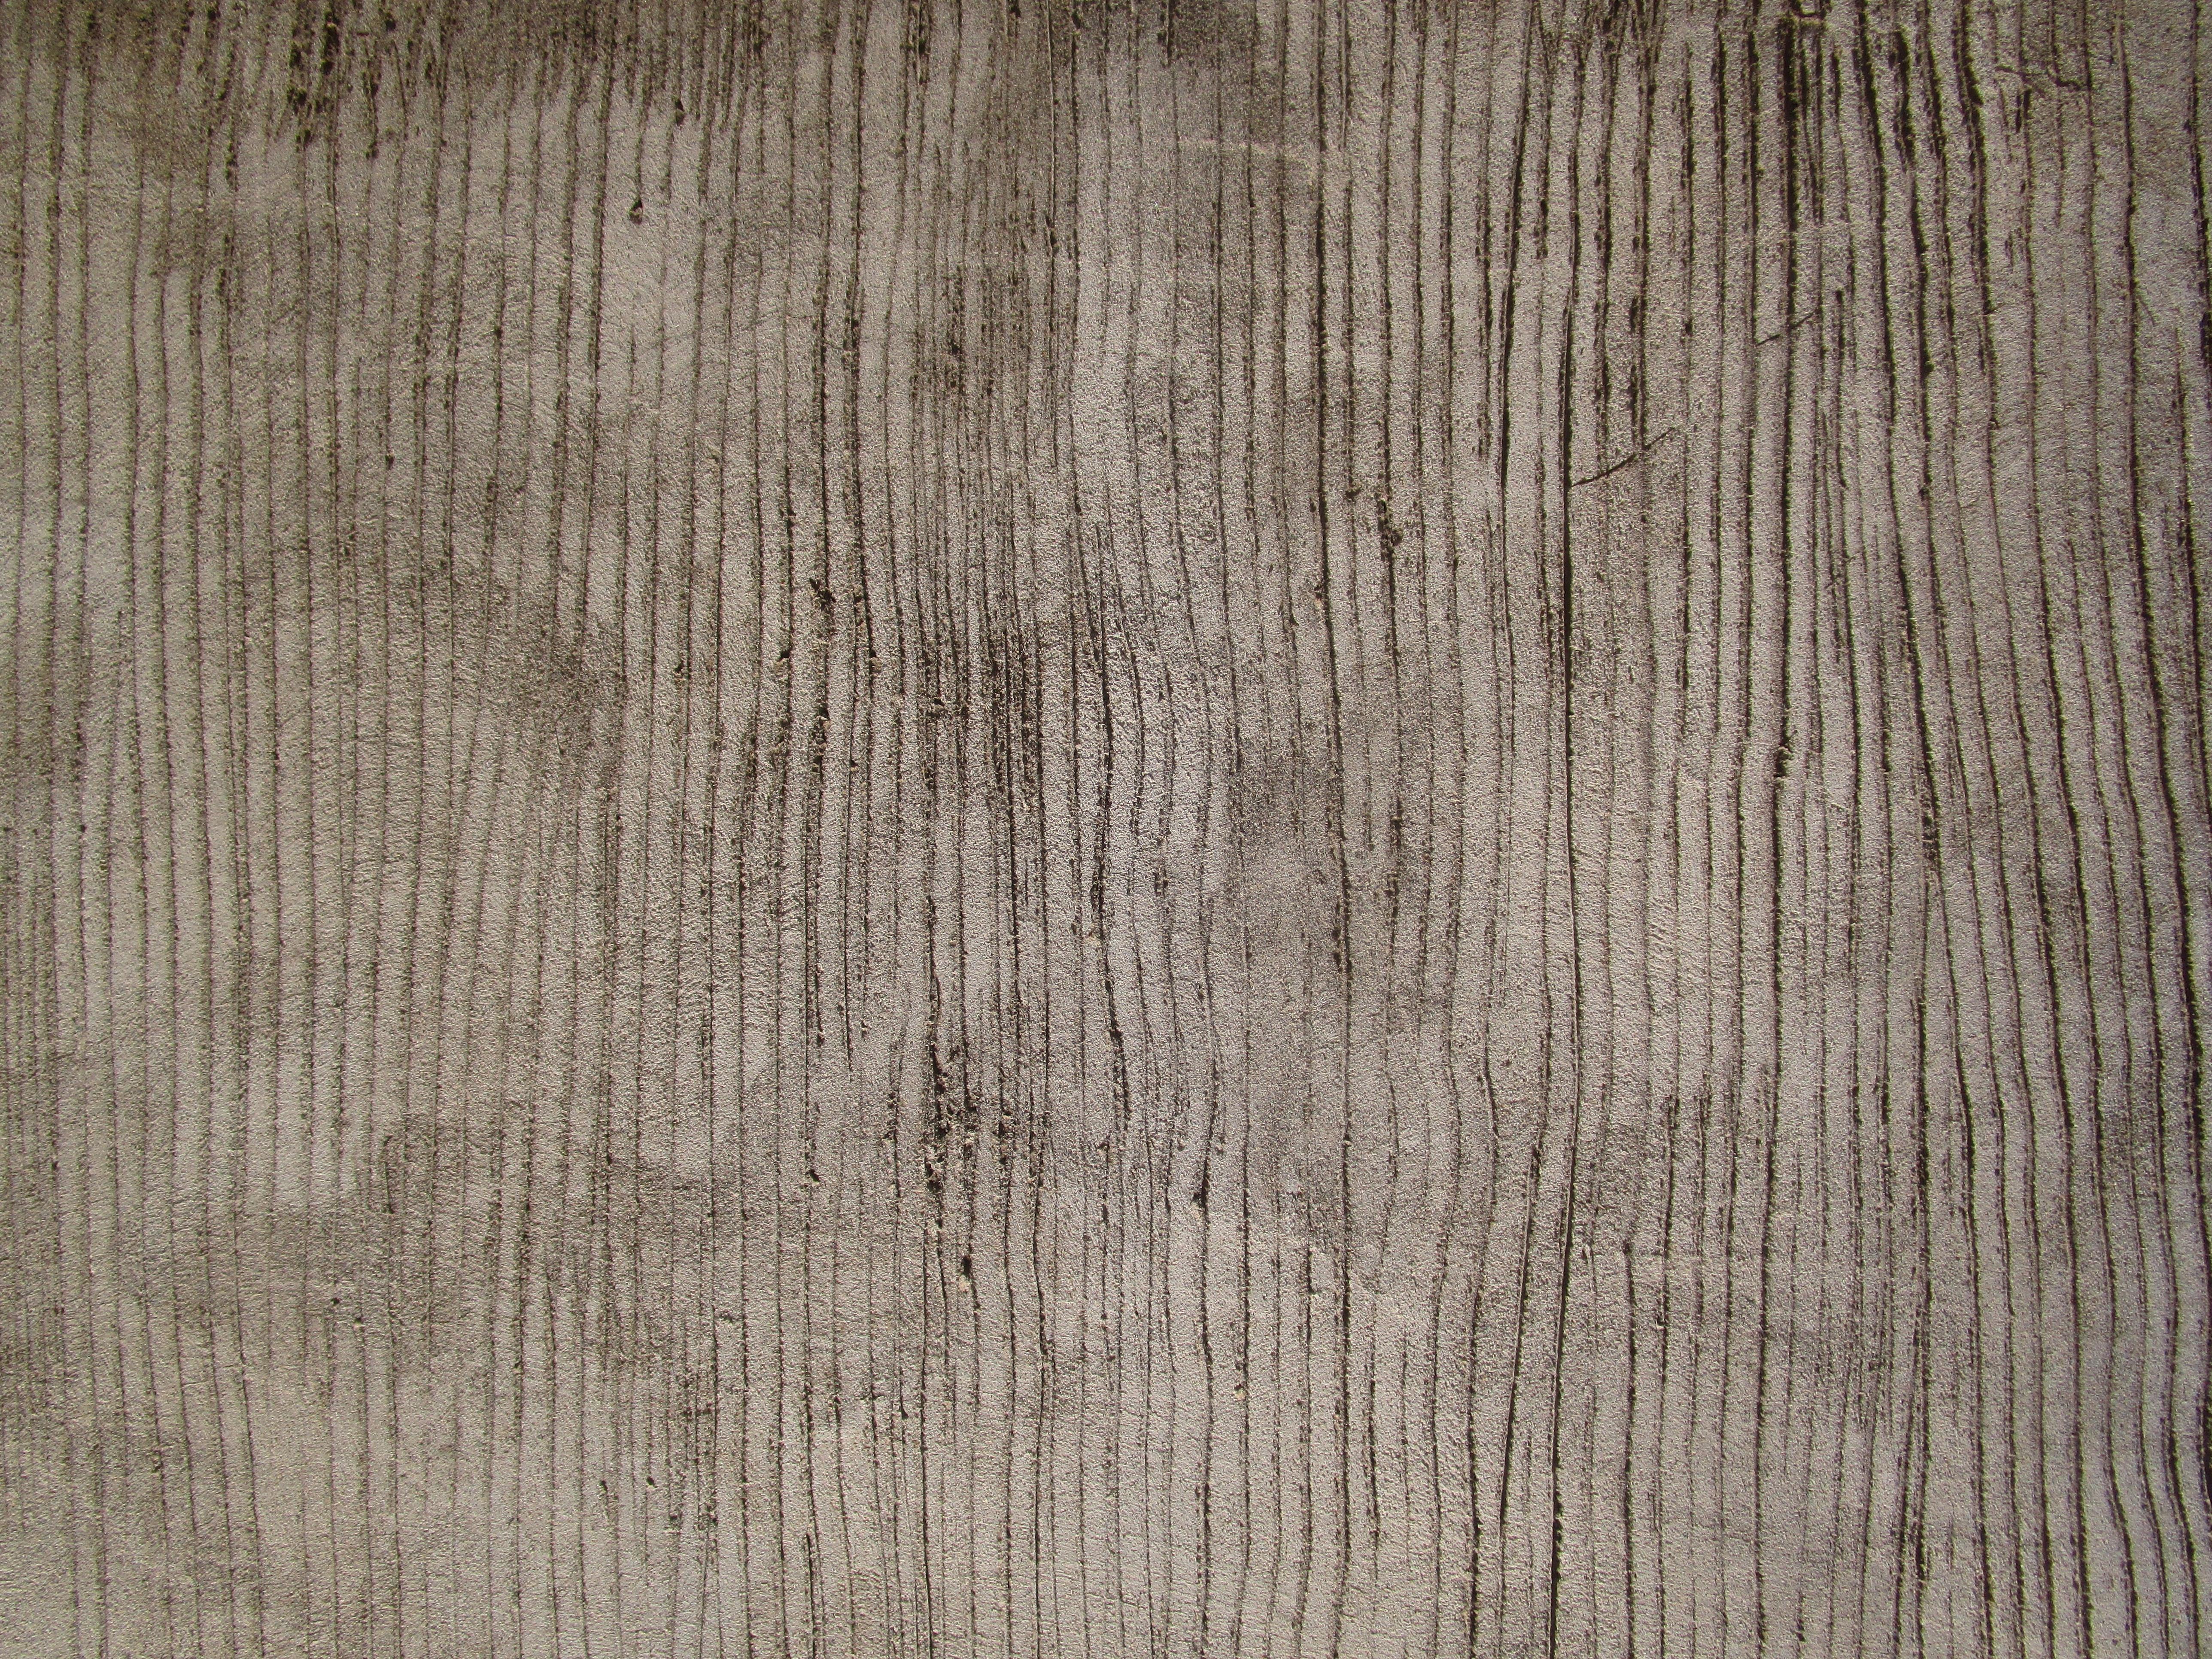 Laminat farben muster  Kostenlose foto : Holz, Textur, Stock, Muster, braun, Hartholz ...